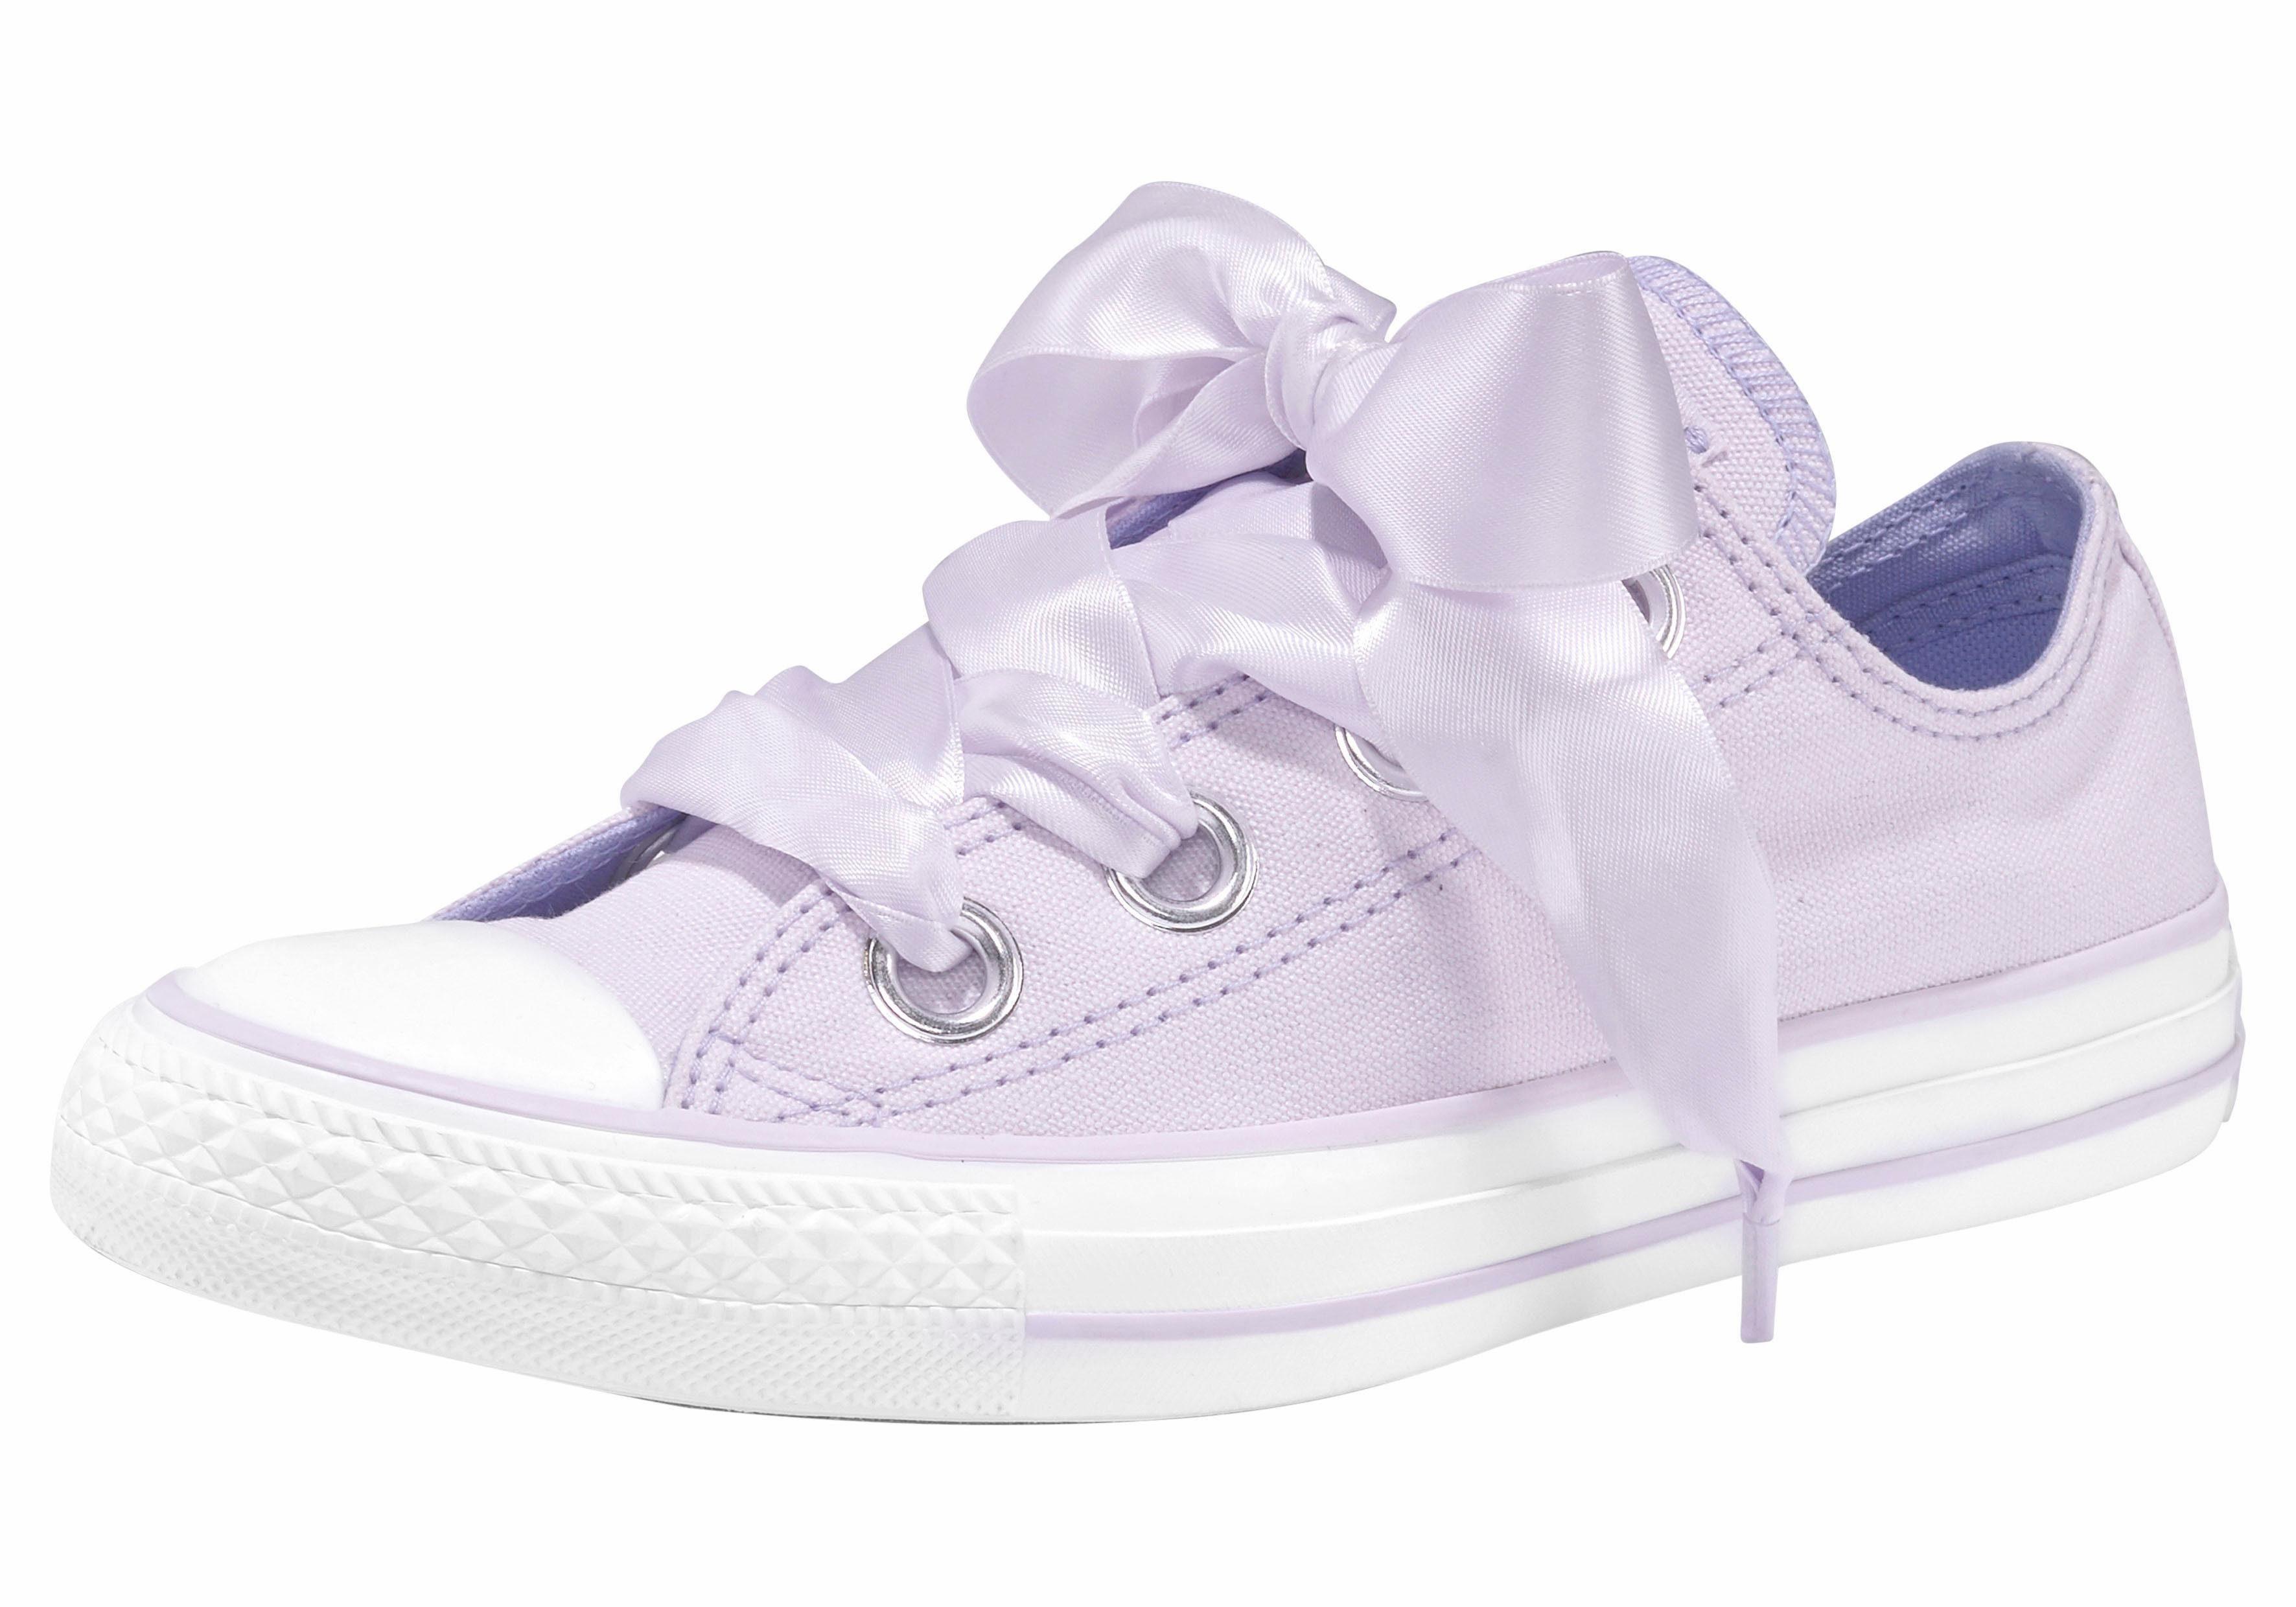 Converse Chuck Taylor All Star Ox Big Eyelet Sneaker online kaufen  flieder